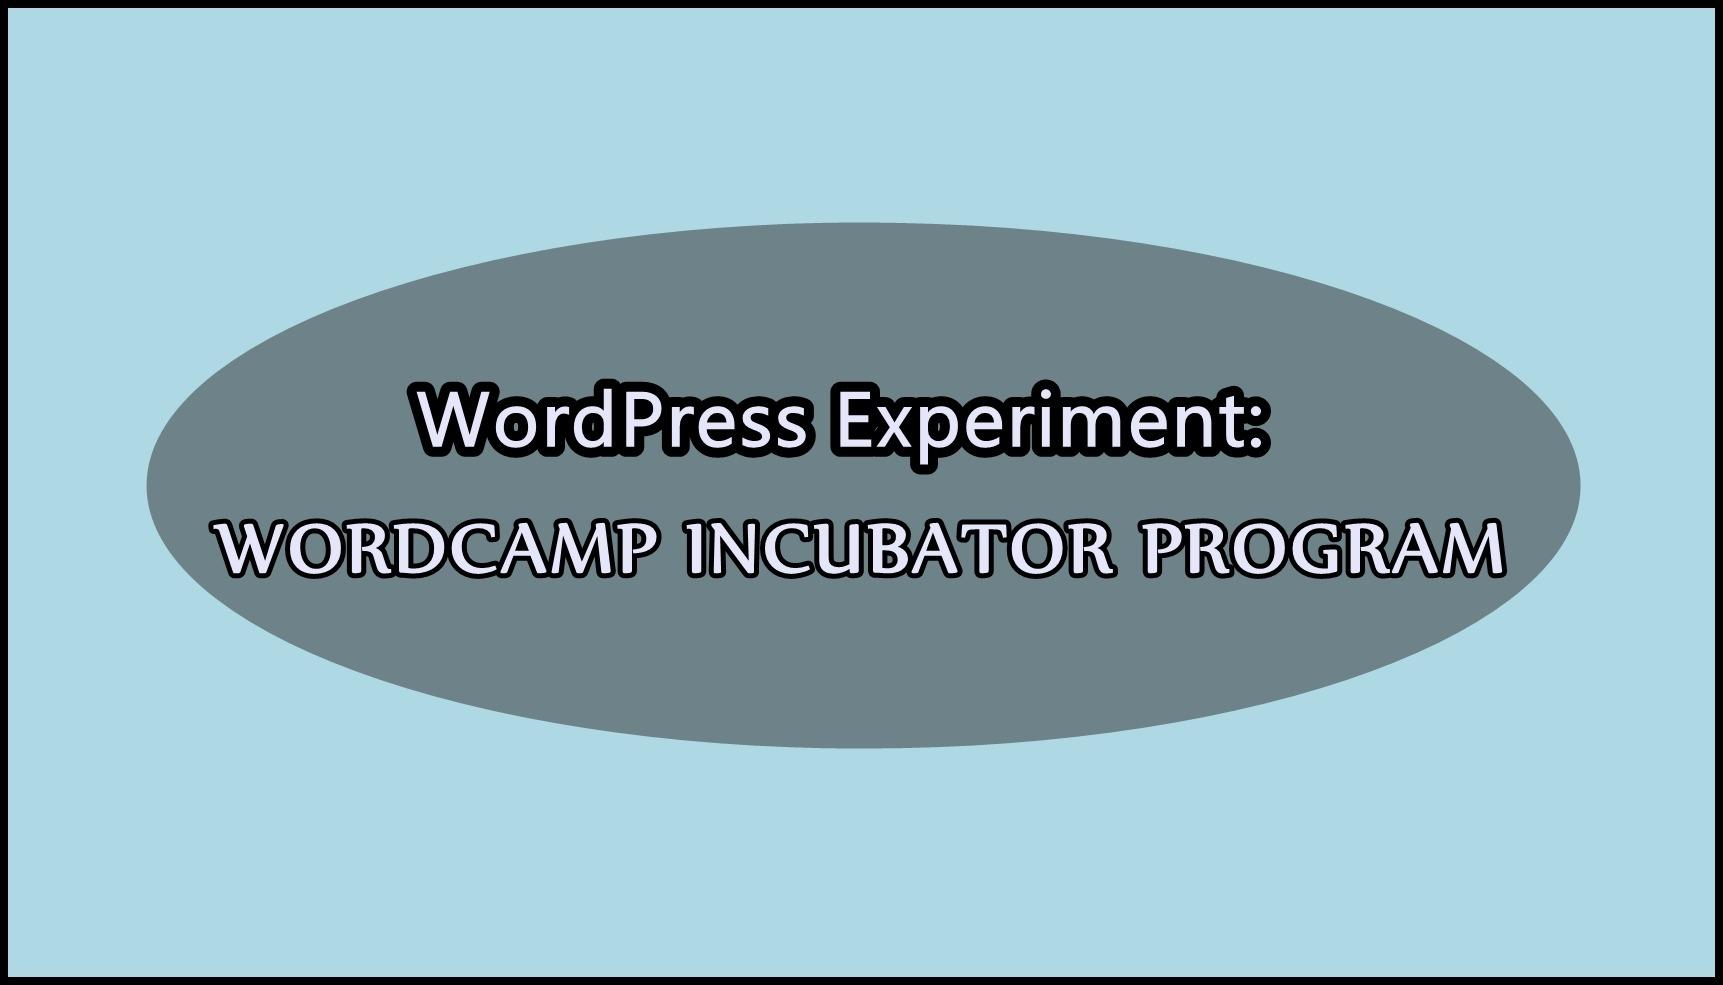 wordcamp-incubator